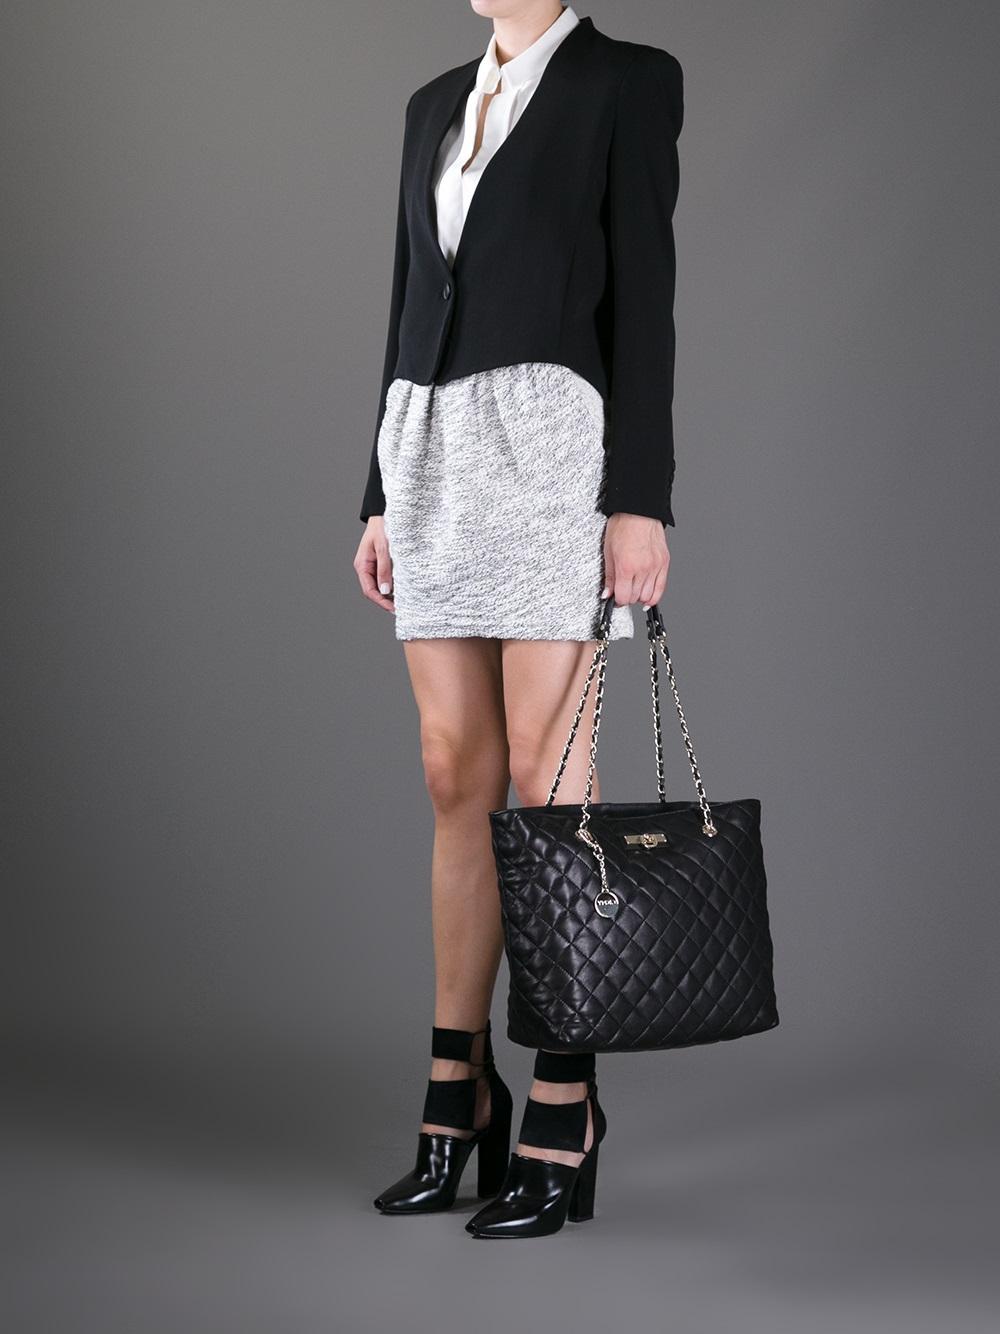 4b809cce0c243d Quilted Black Leather Handbag - Best Handbag In 2018